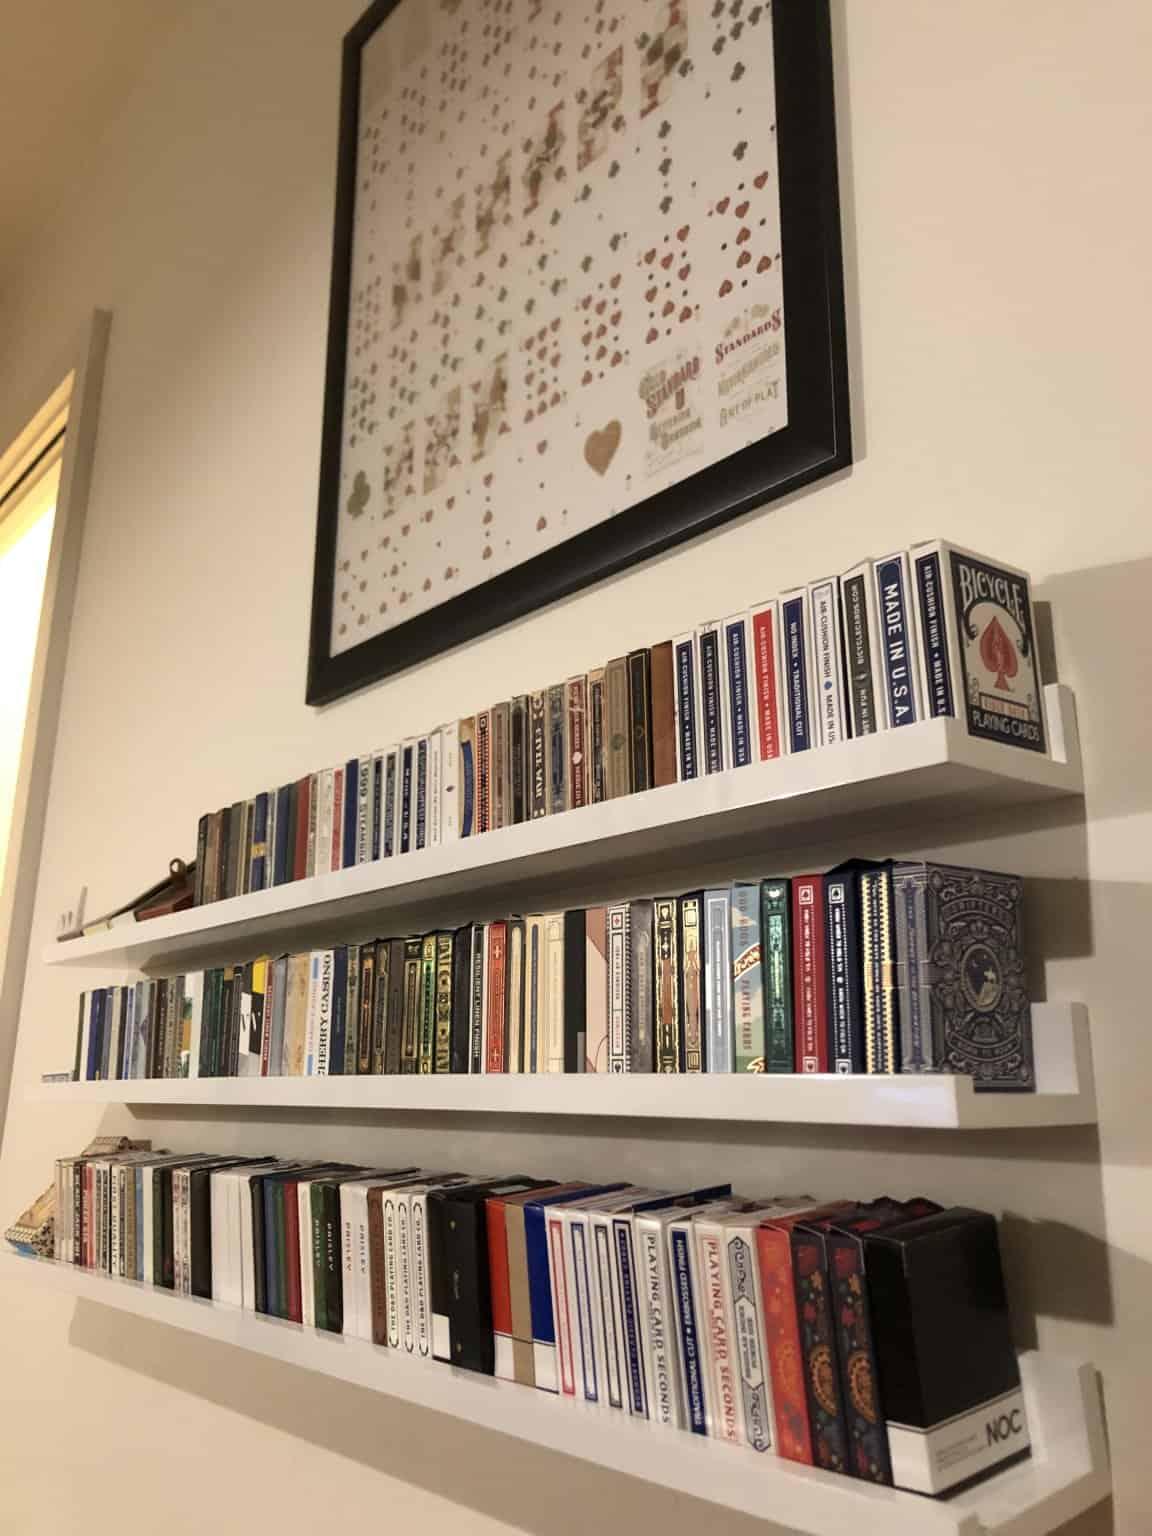 Finally on the wall !!! 🎉 IG: sir.croupier 6CFC29F7-C6C5-451F-BDFF-E79FF23165DFD0D2AC8D-FD20